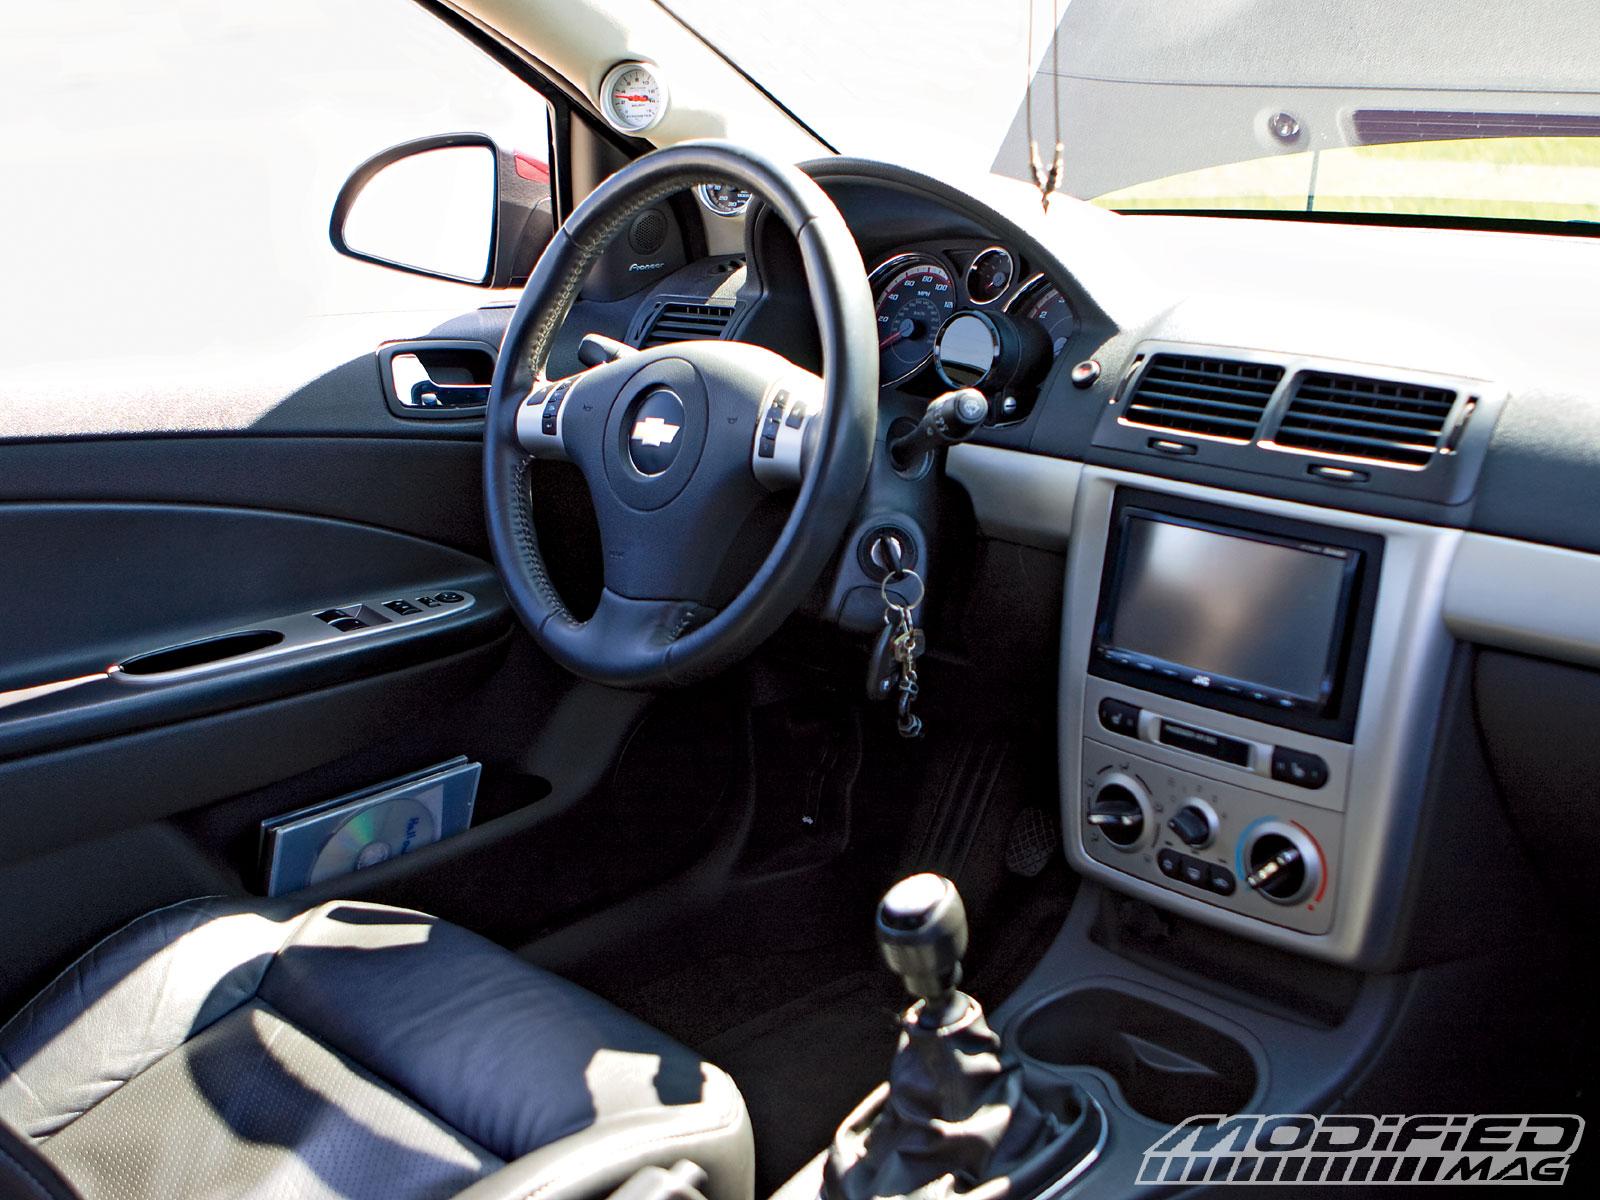 Chevrolet Cobalt 2007 foto - 2